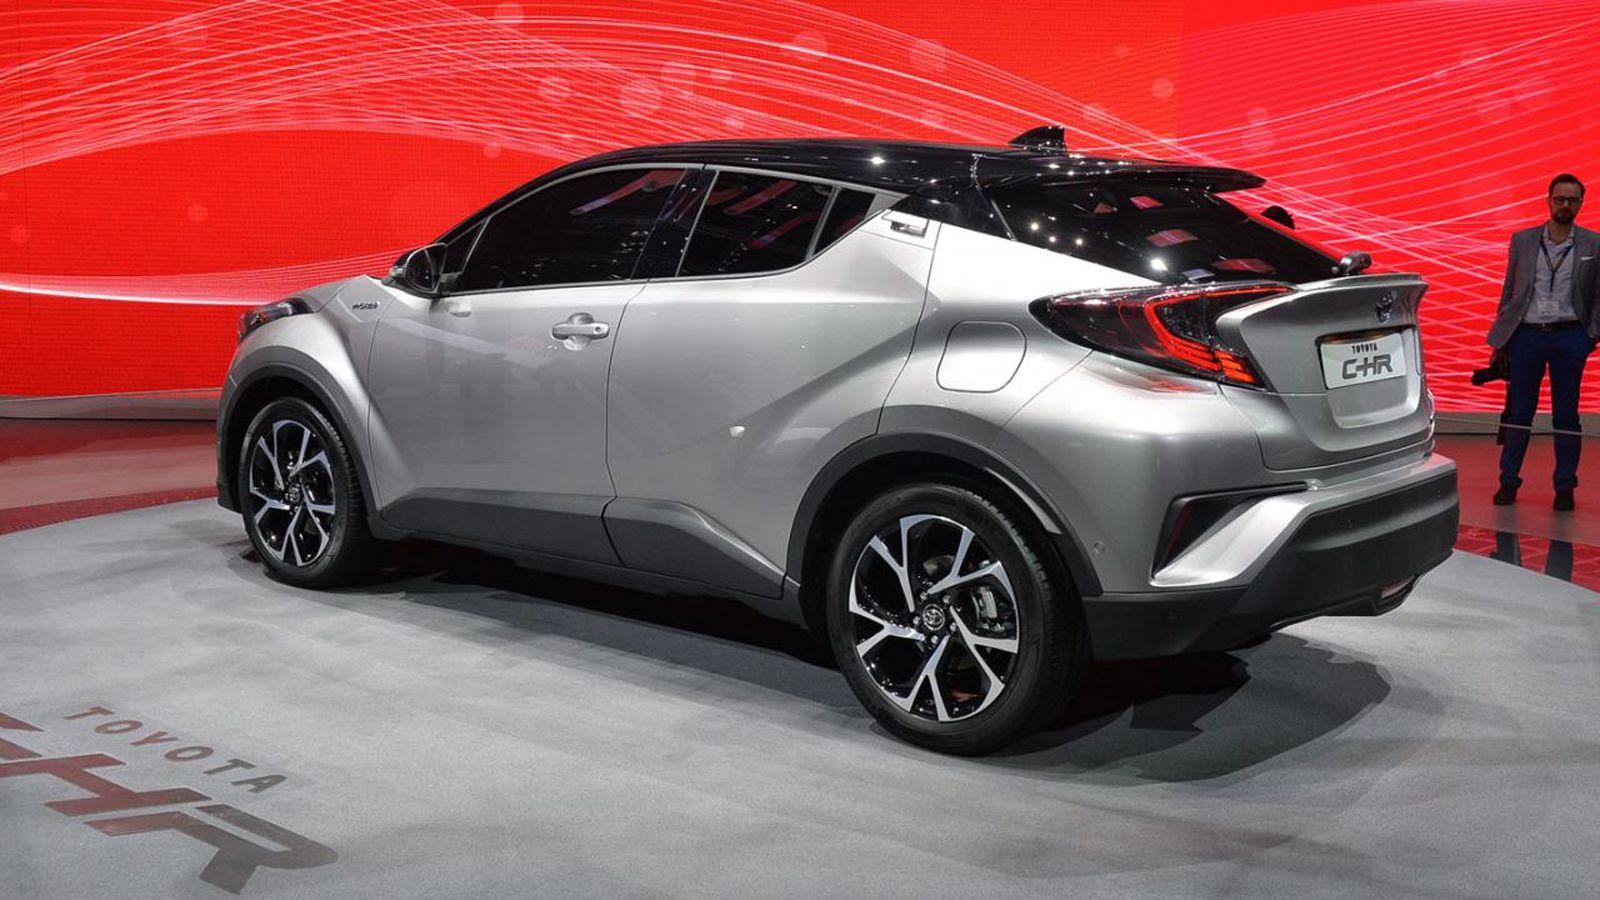 C Hr Toyota Suv Toyota